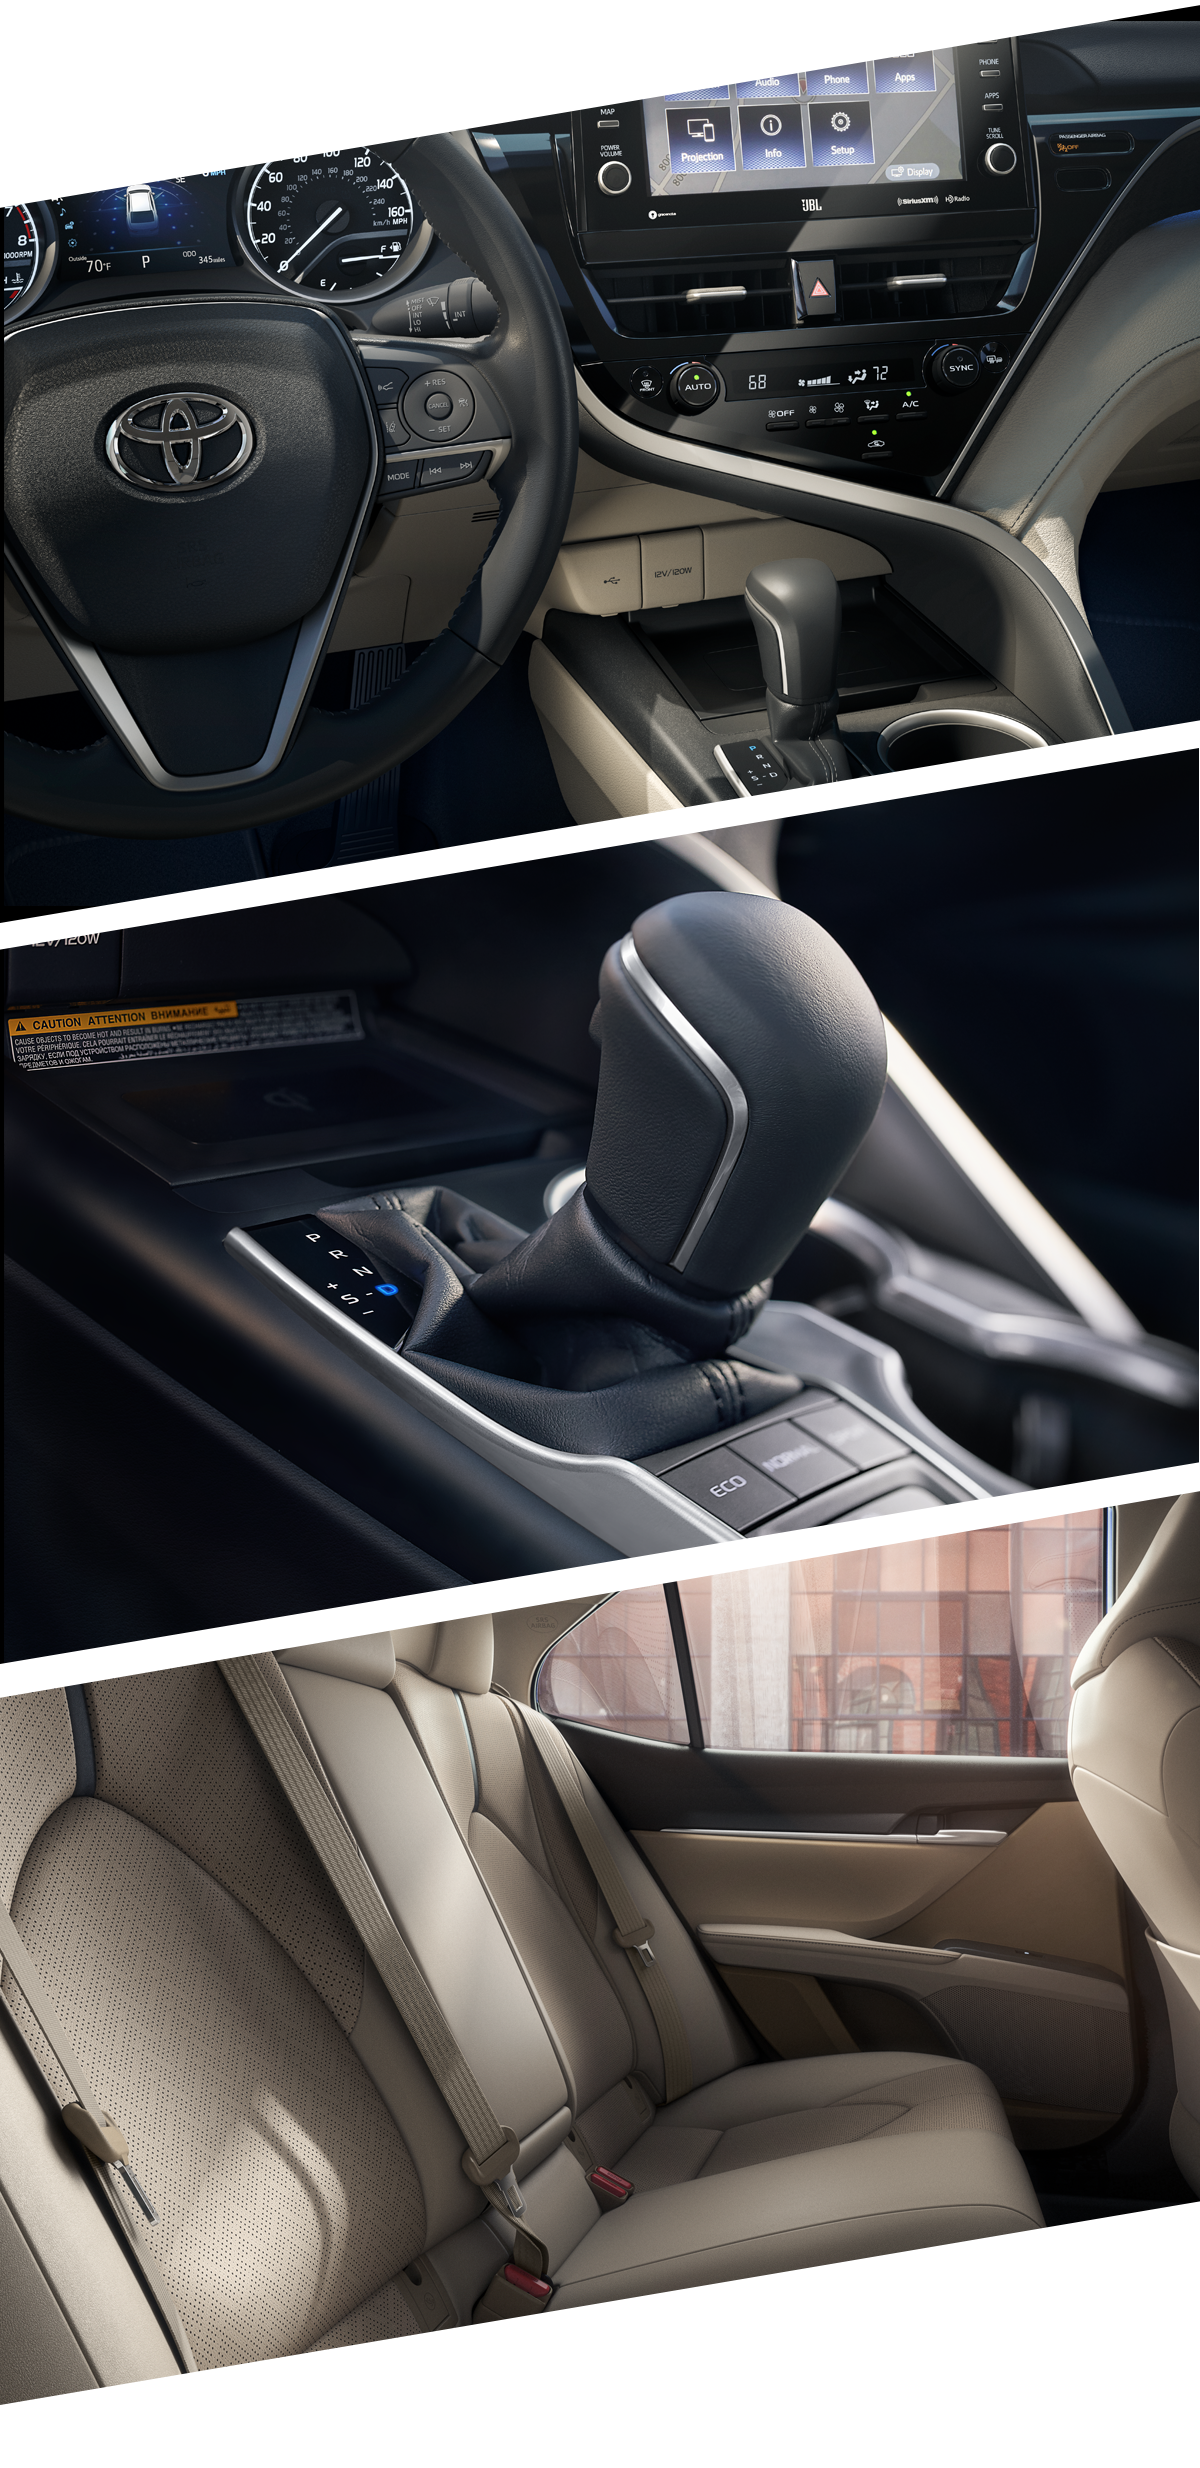 2021 Toyota Camry Interior Greenville, MS